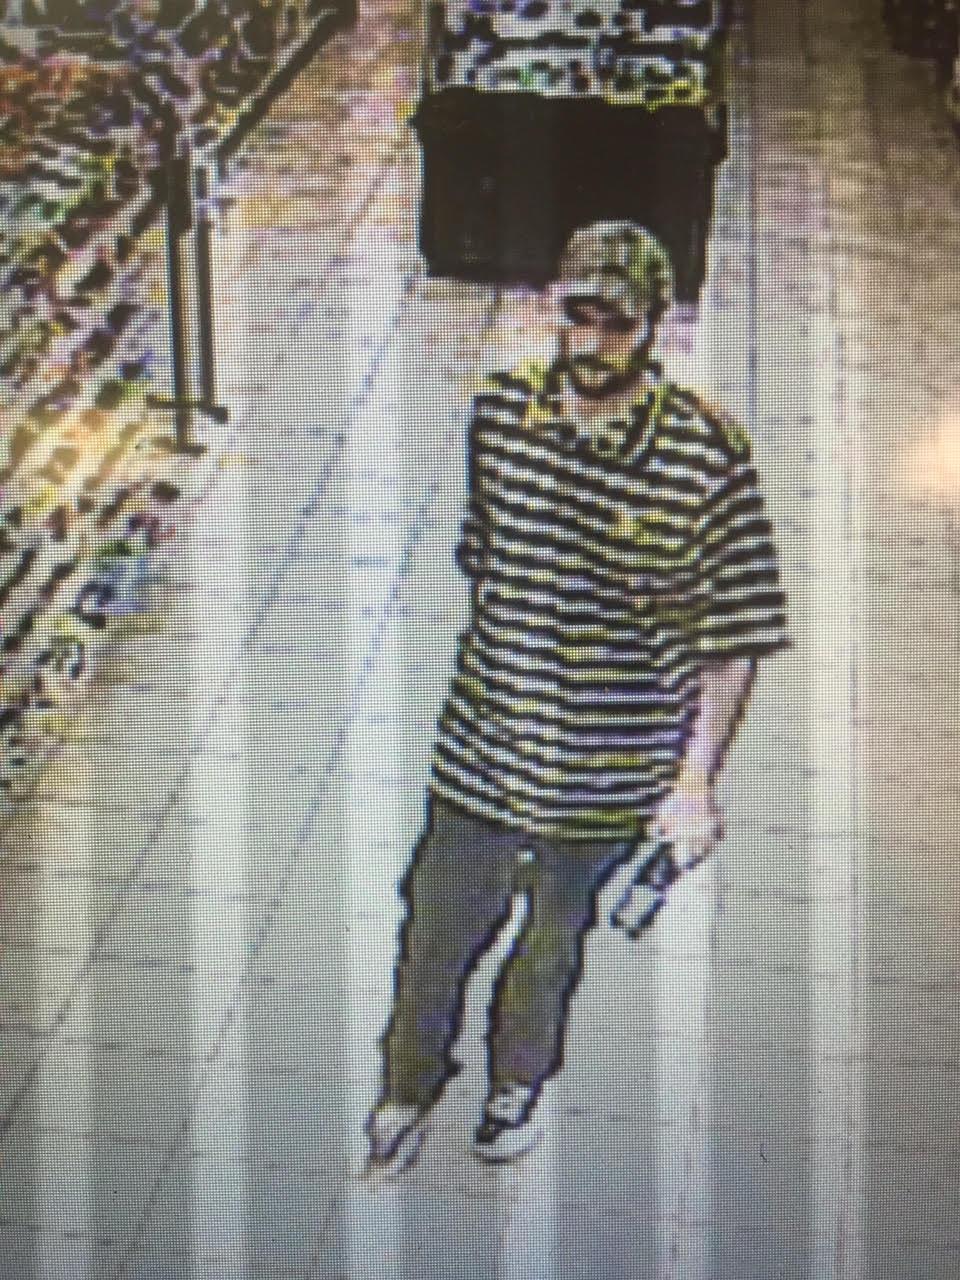 Deputies need help IDing this man.